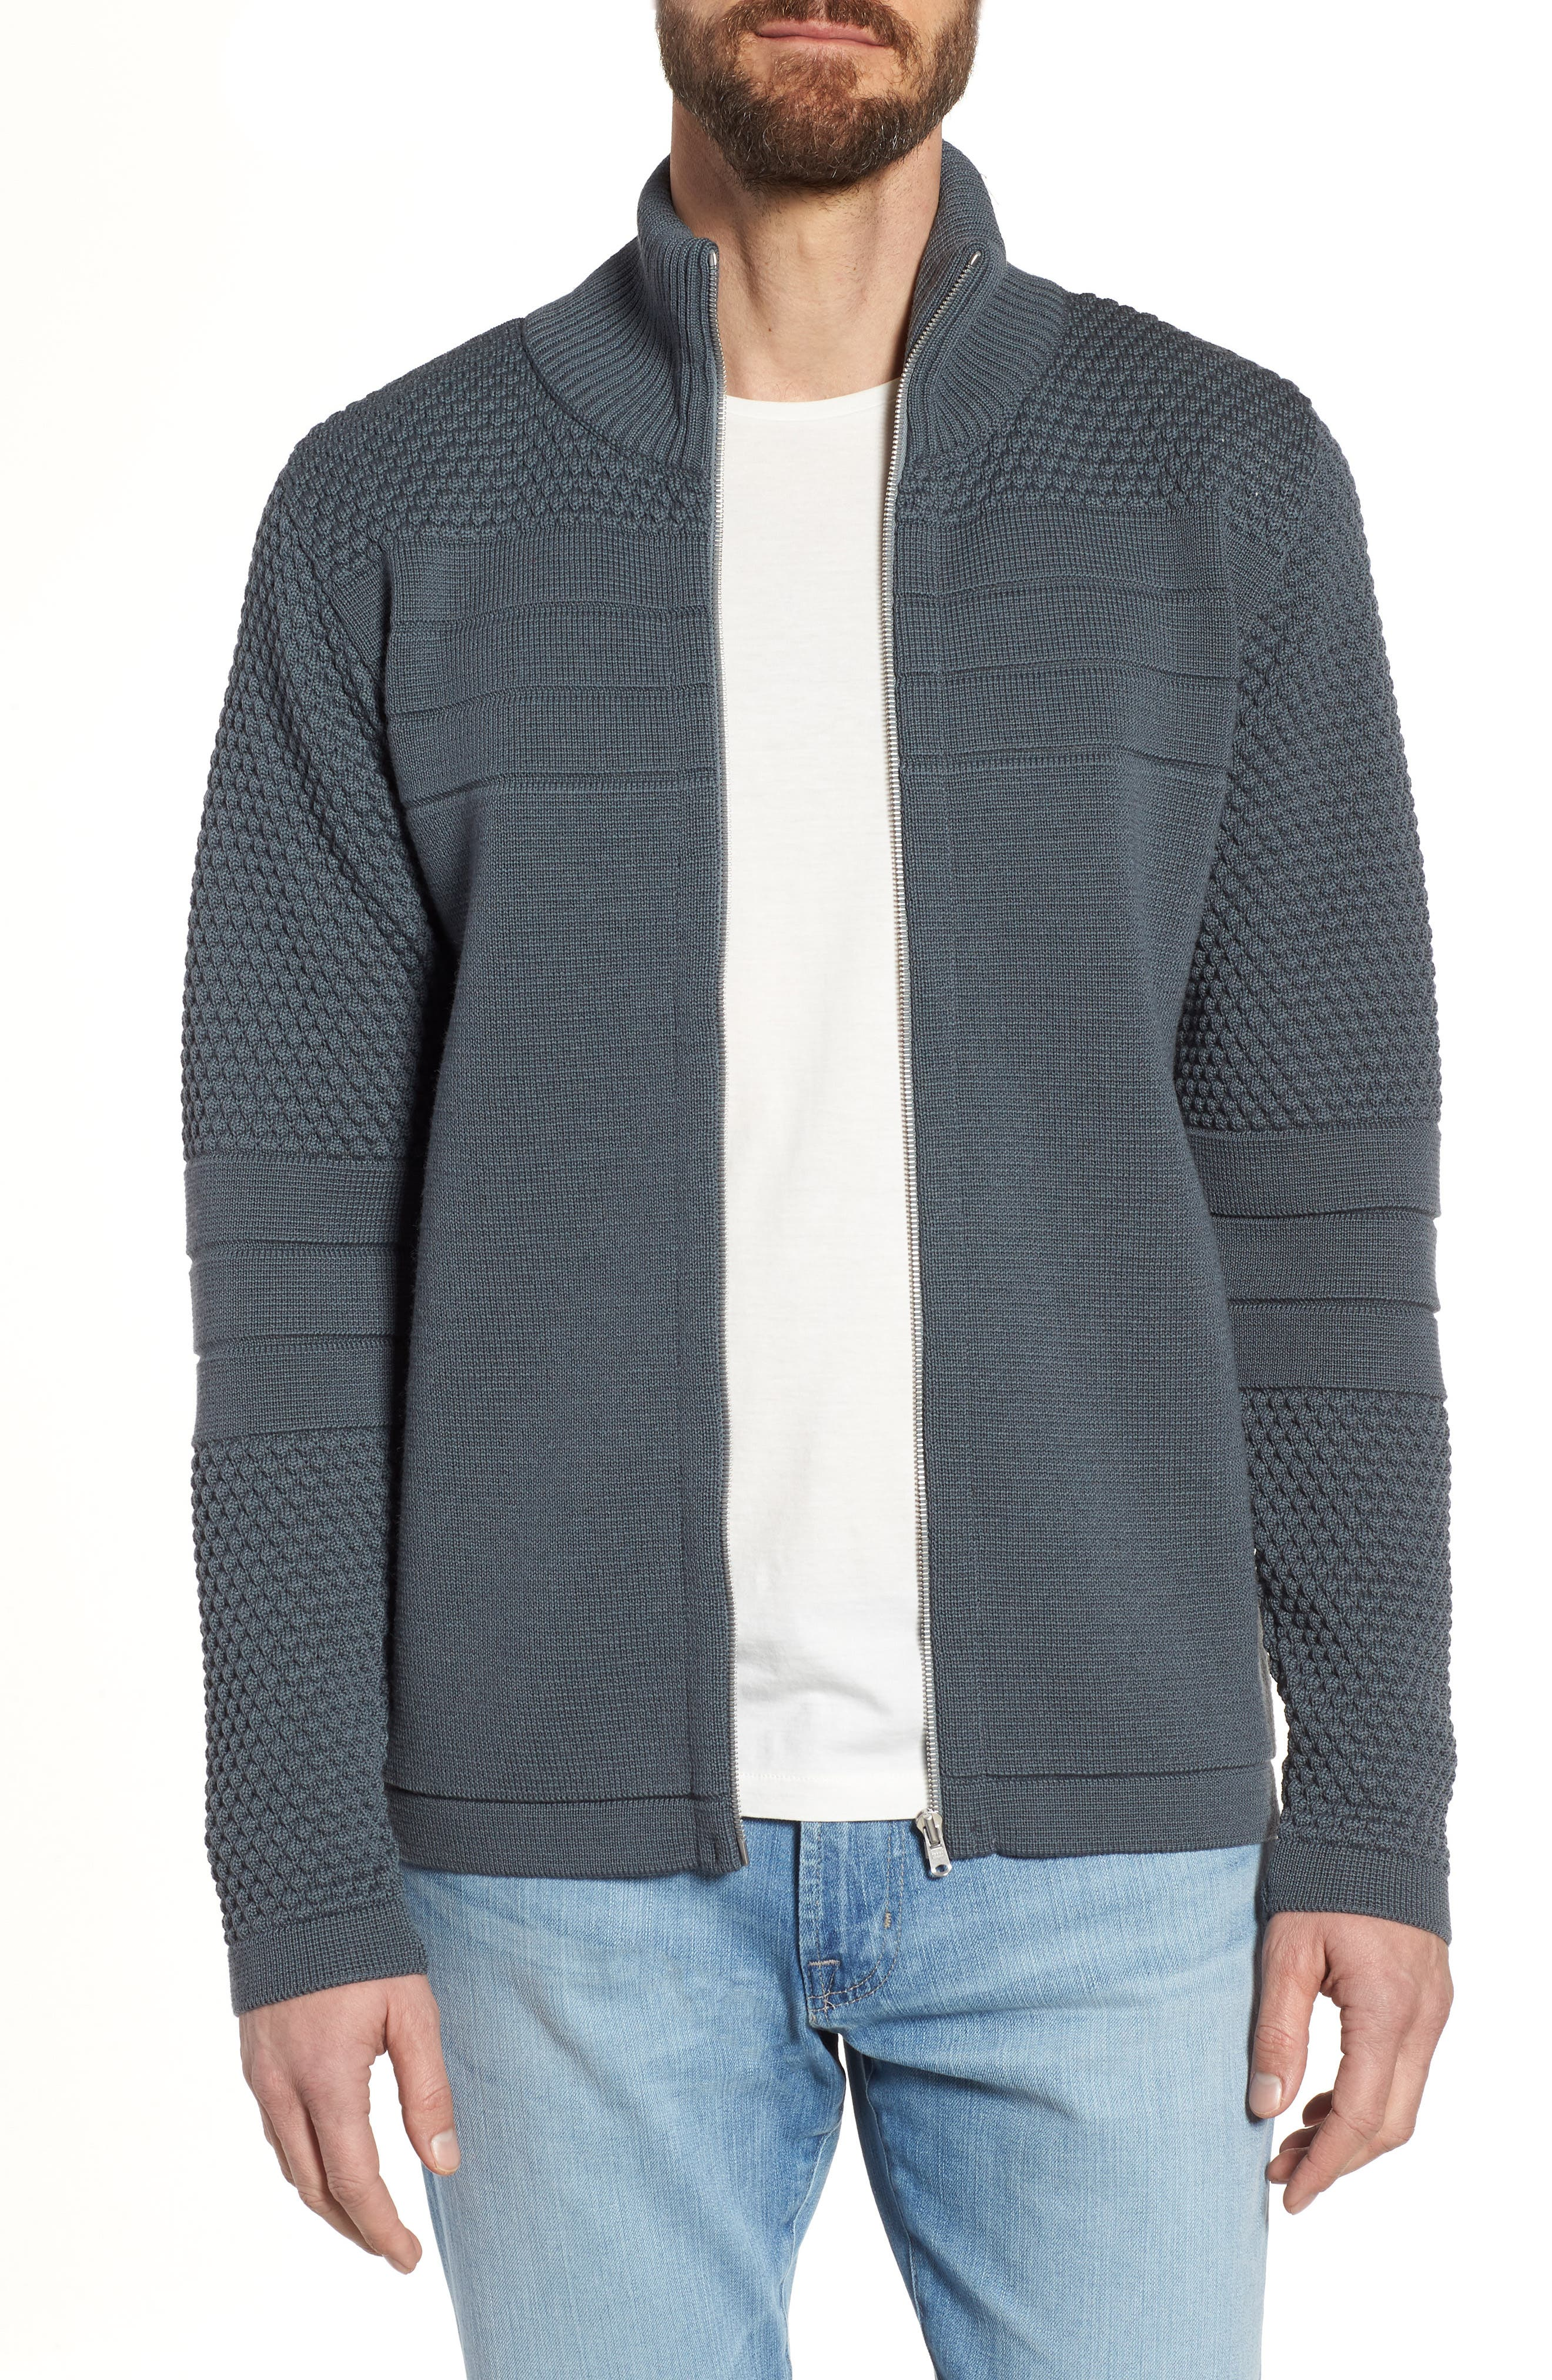 Torso Jacket,                             Main thumbnail 1, color,                             Uniform Grey